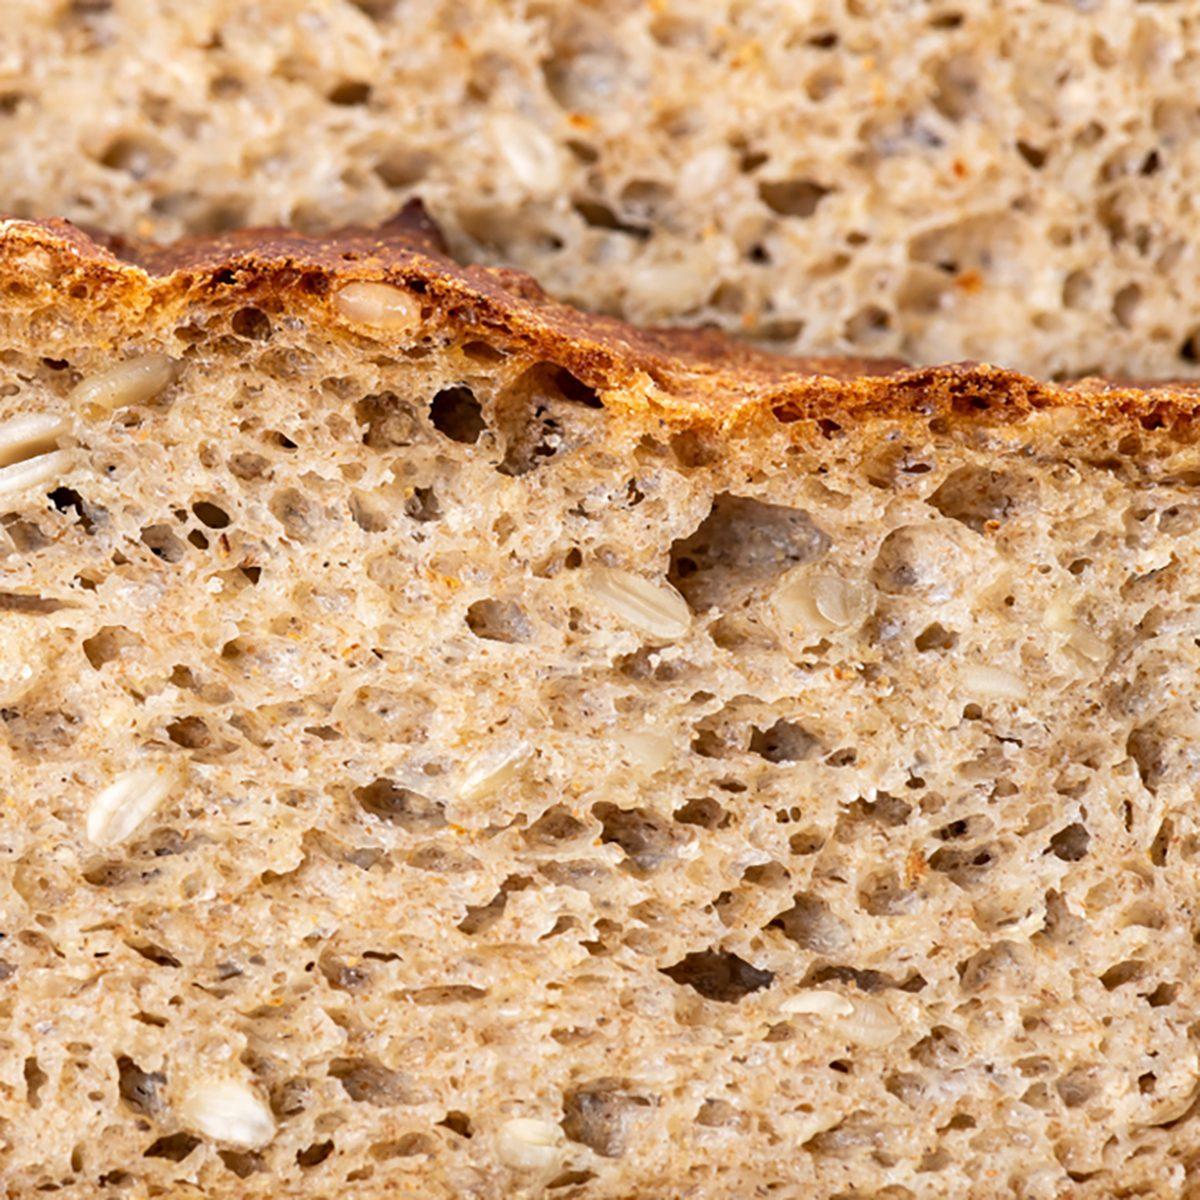 whole grain or whole wheat bread, slices of homemade bread.